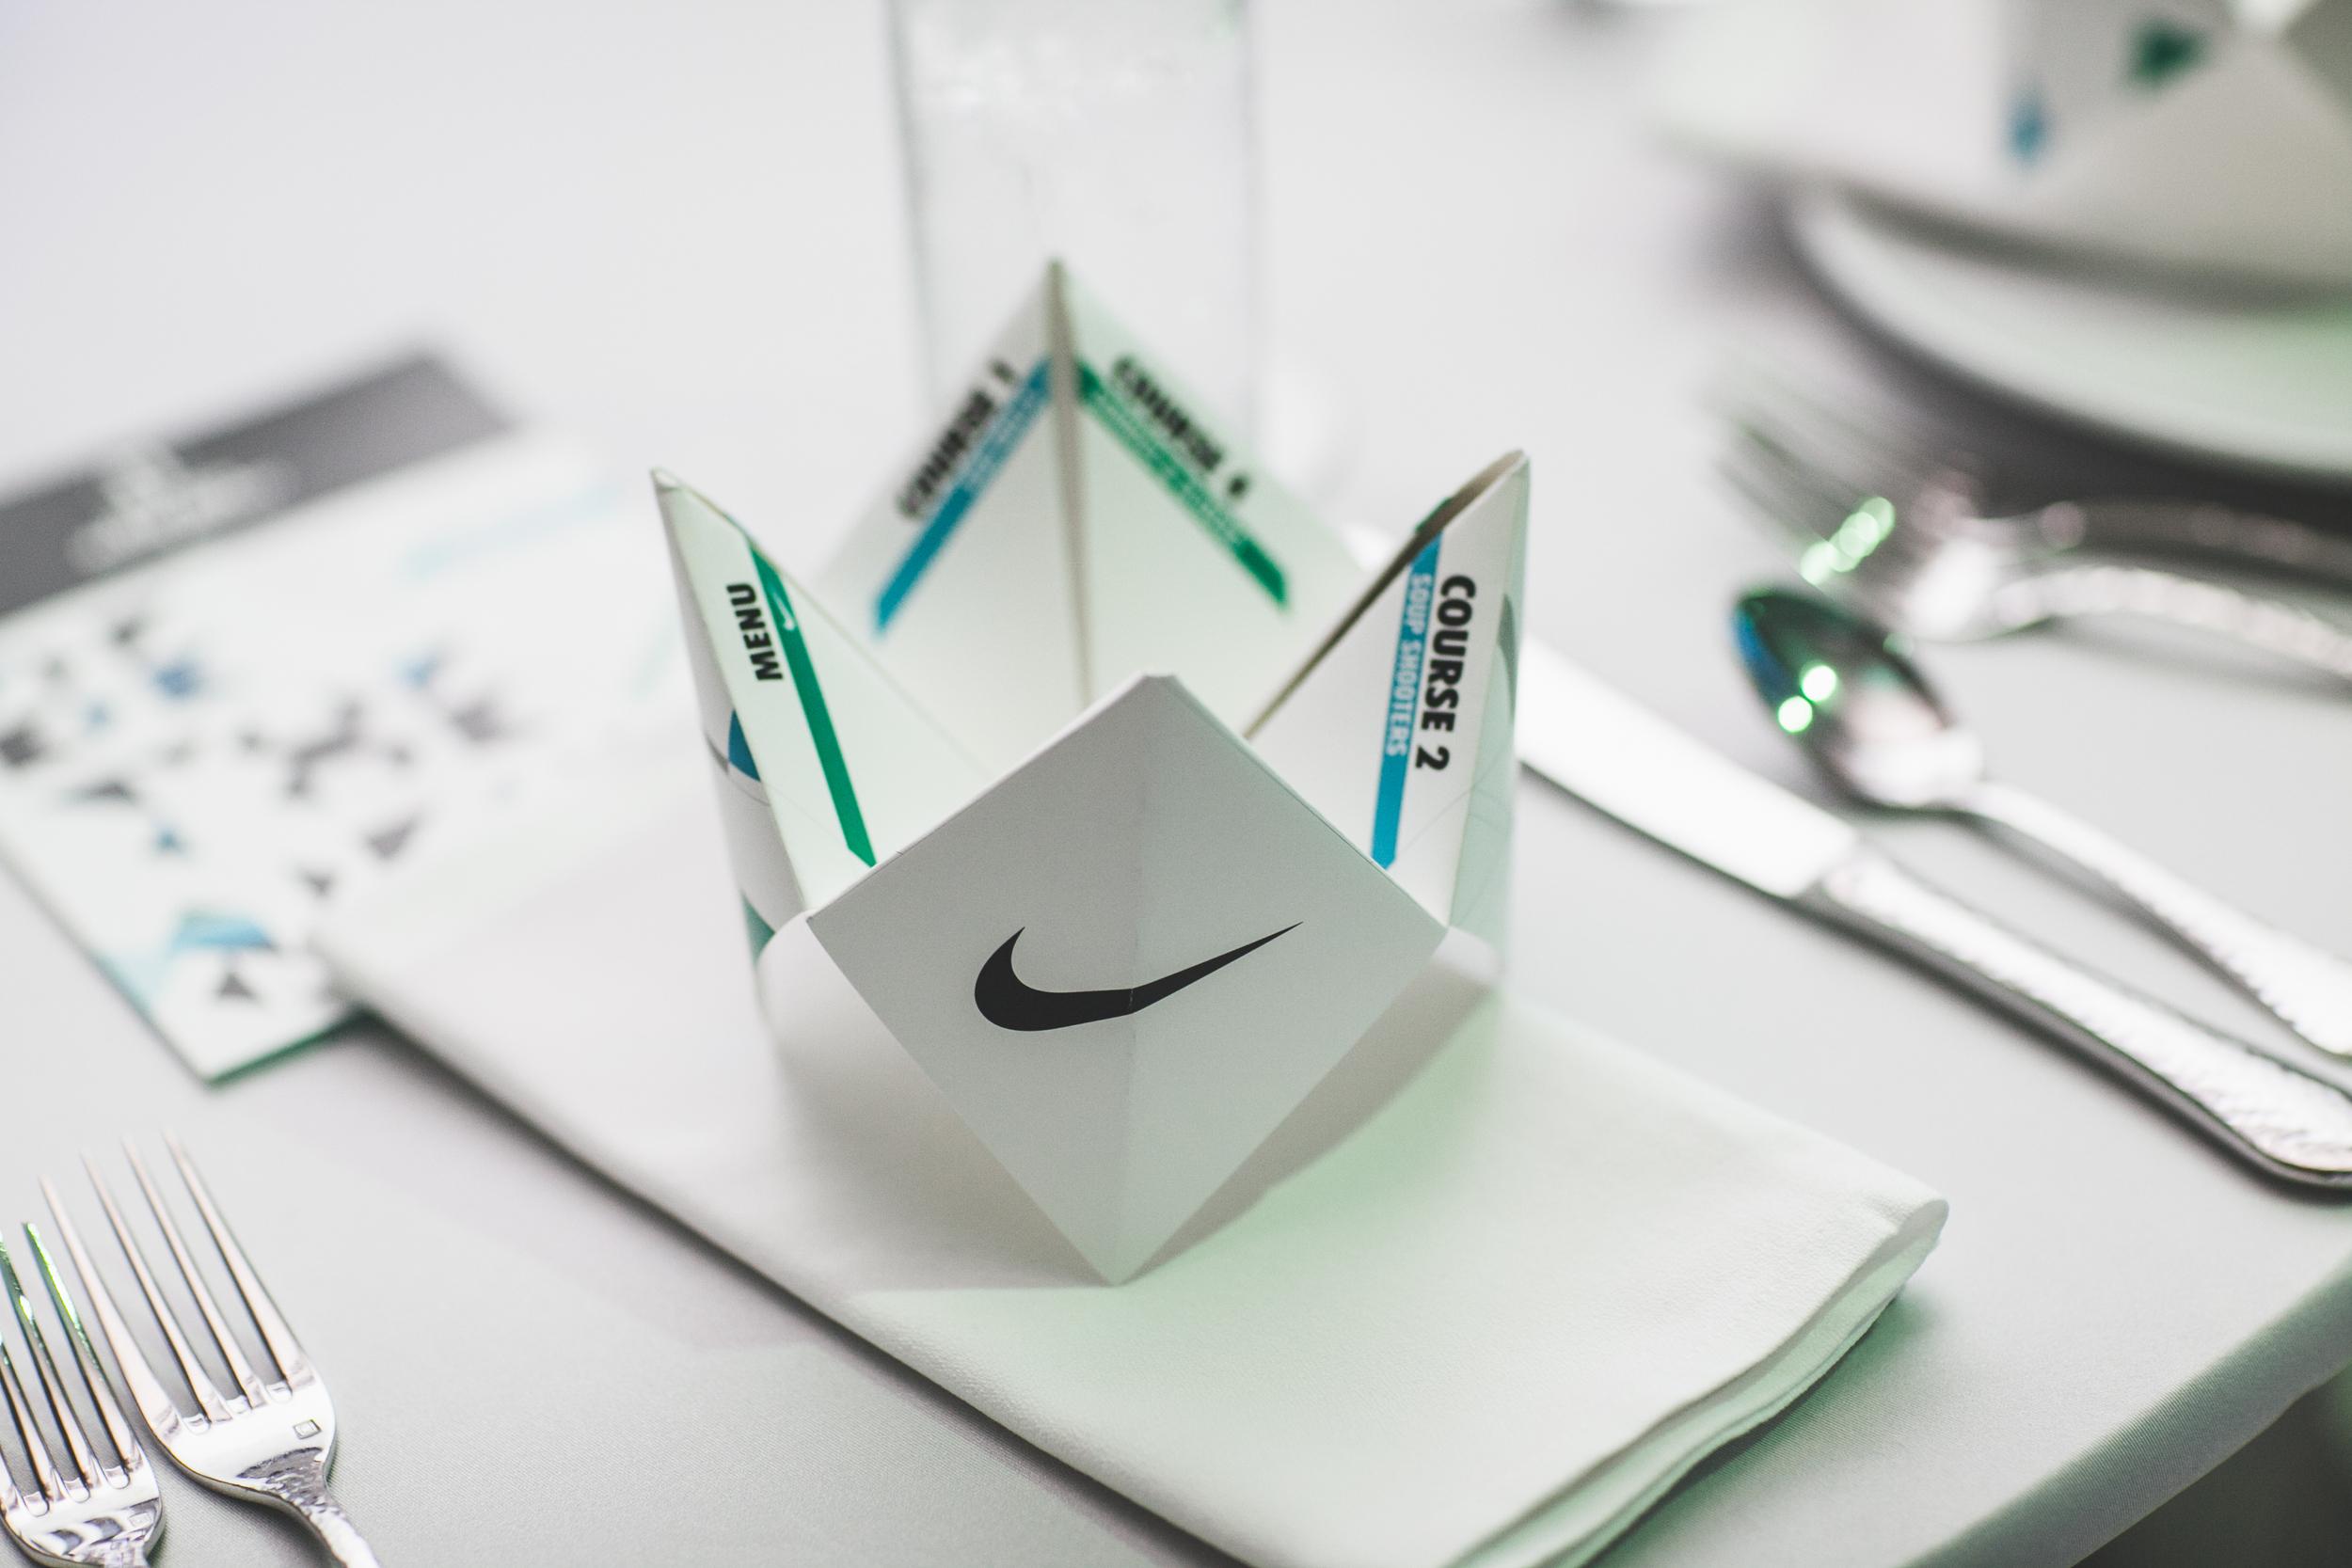 NikeTechMaxims-12.jpg